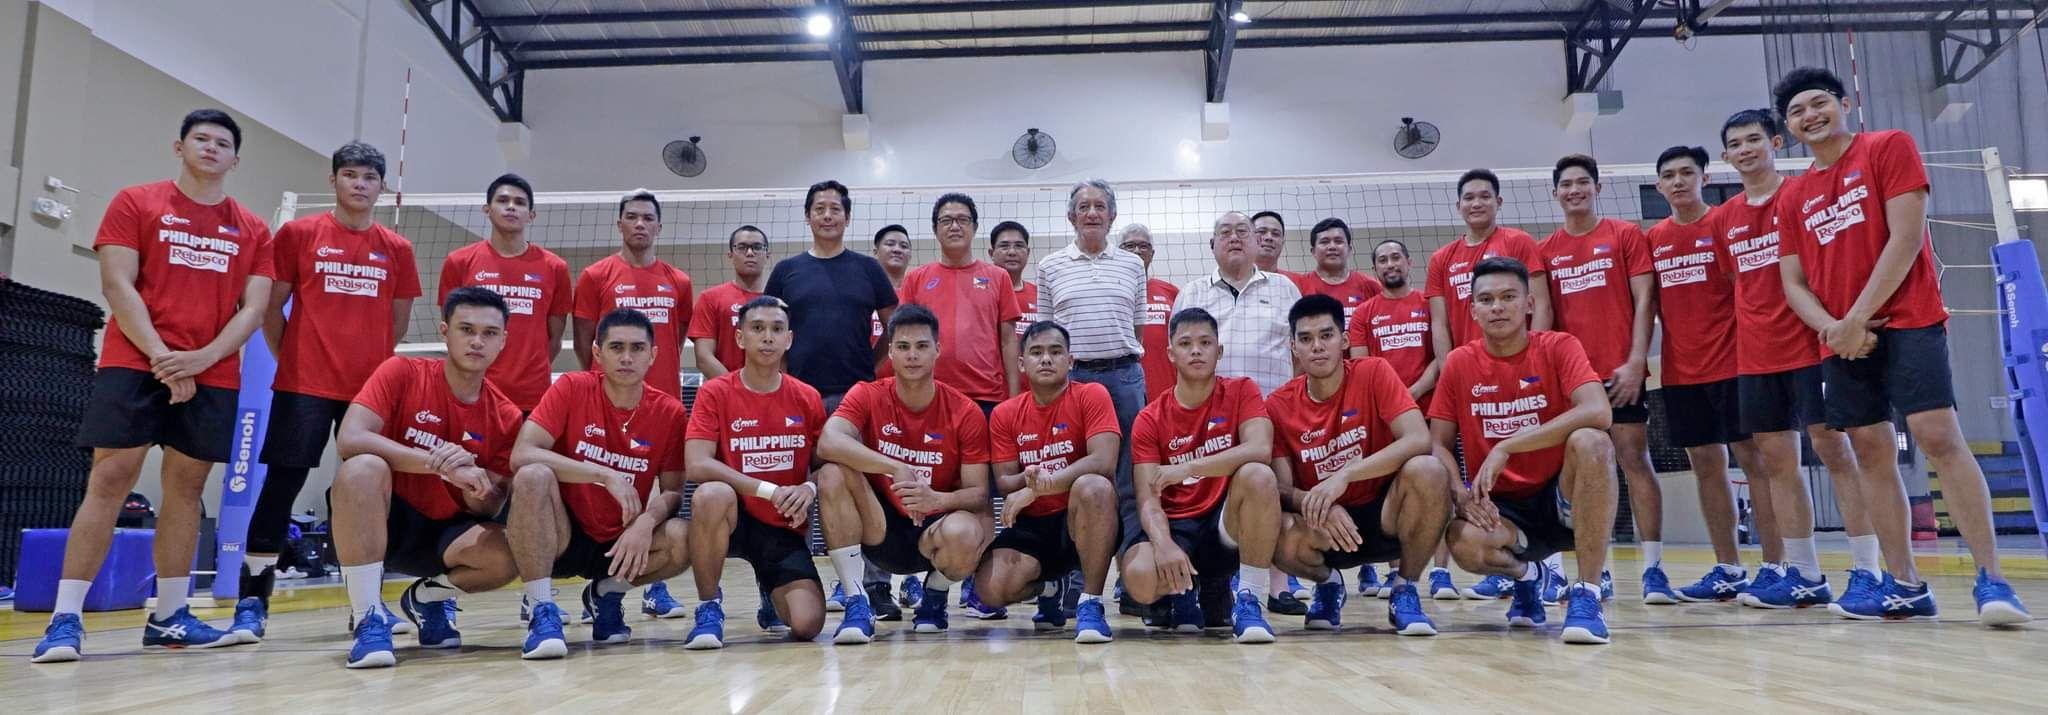 Philippine men's volleyball pool